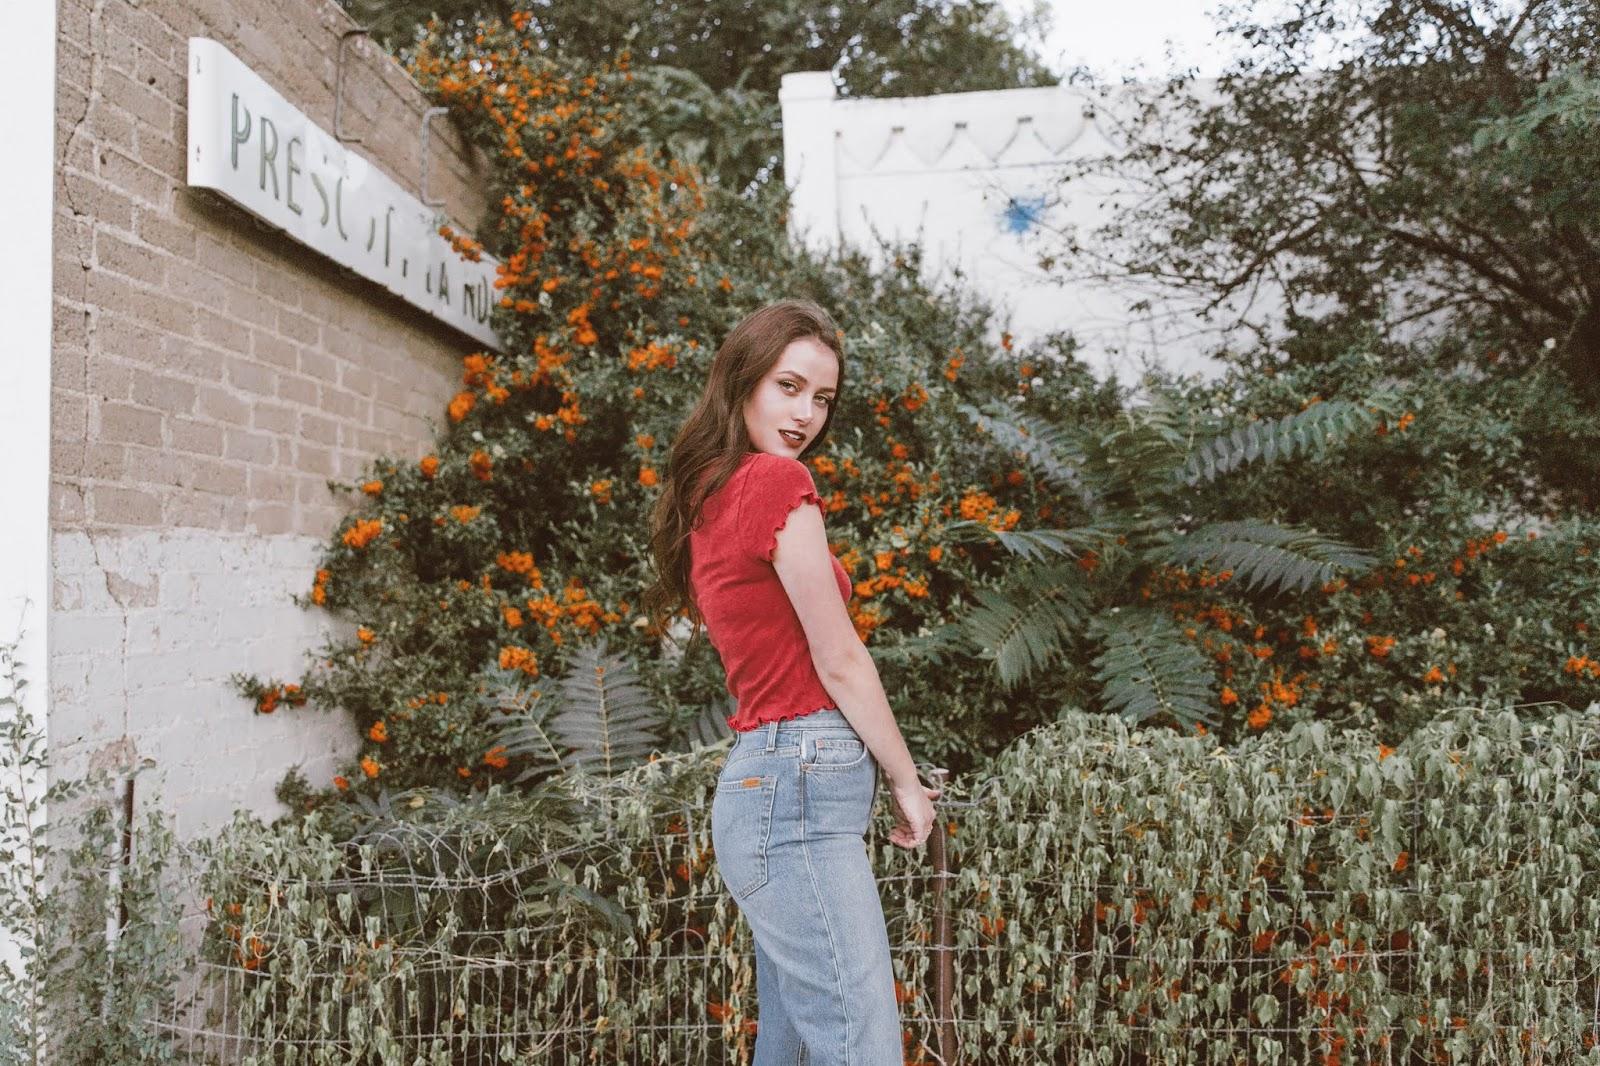 Arizona Girl fashion blog, Joe's Jeans, Stylinity, platform sandals, denim jacket, fall style 2018, Canadian tuxedo, Shelly Stuckman